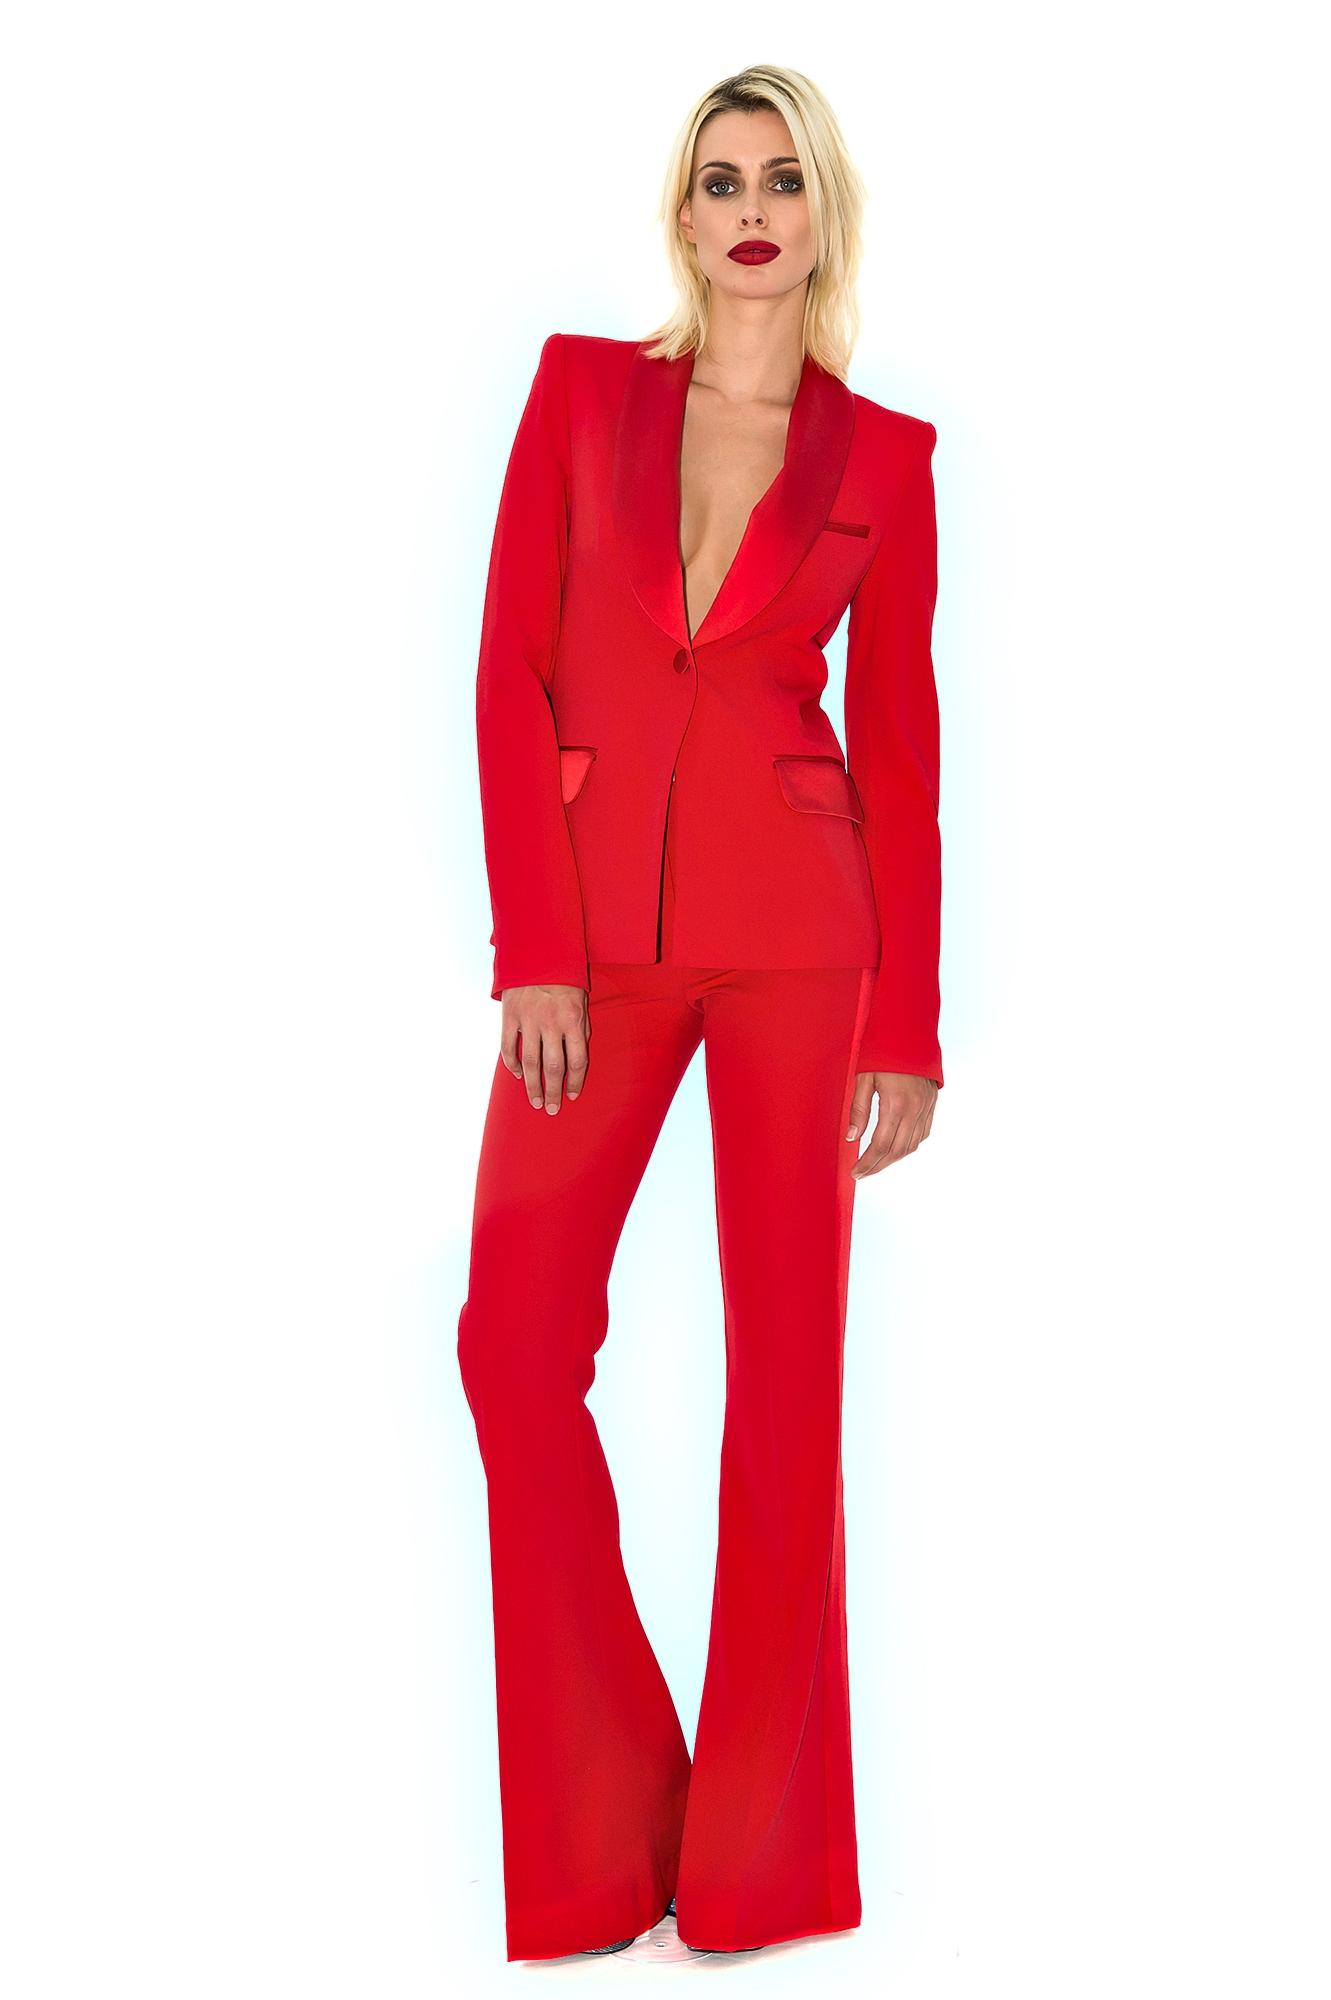 pantalon de smoking femme pantalon habill smoking rouge stefanie renoma. Black Bedroom Furniture Sets. Home Design Ideas